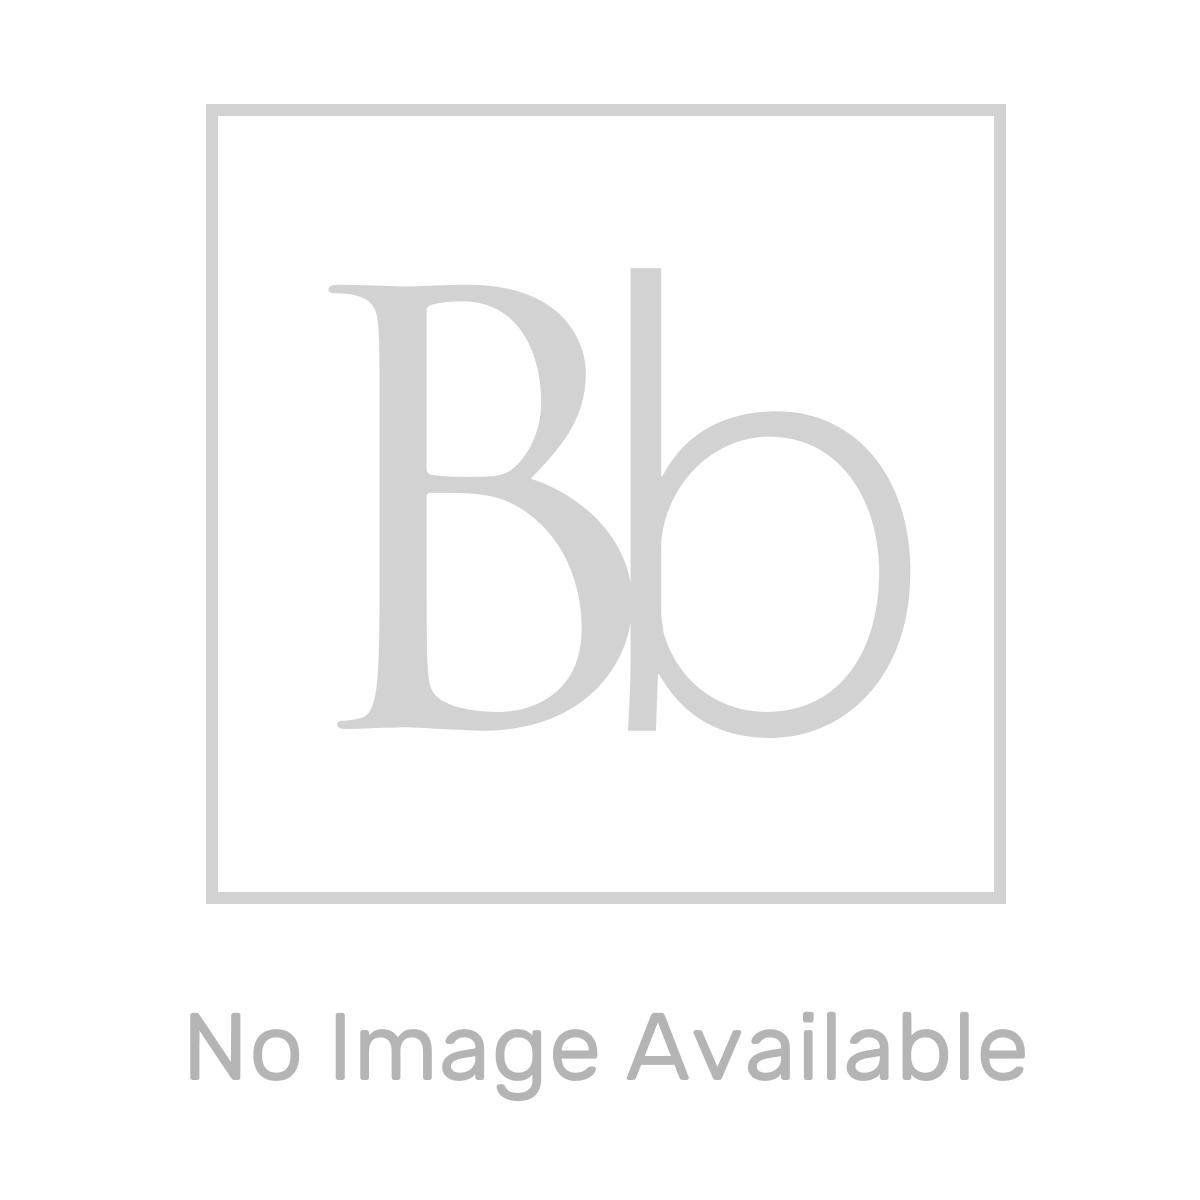 Croydex Euro Soap Dispenser Duo in Chrome